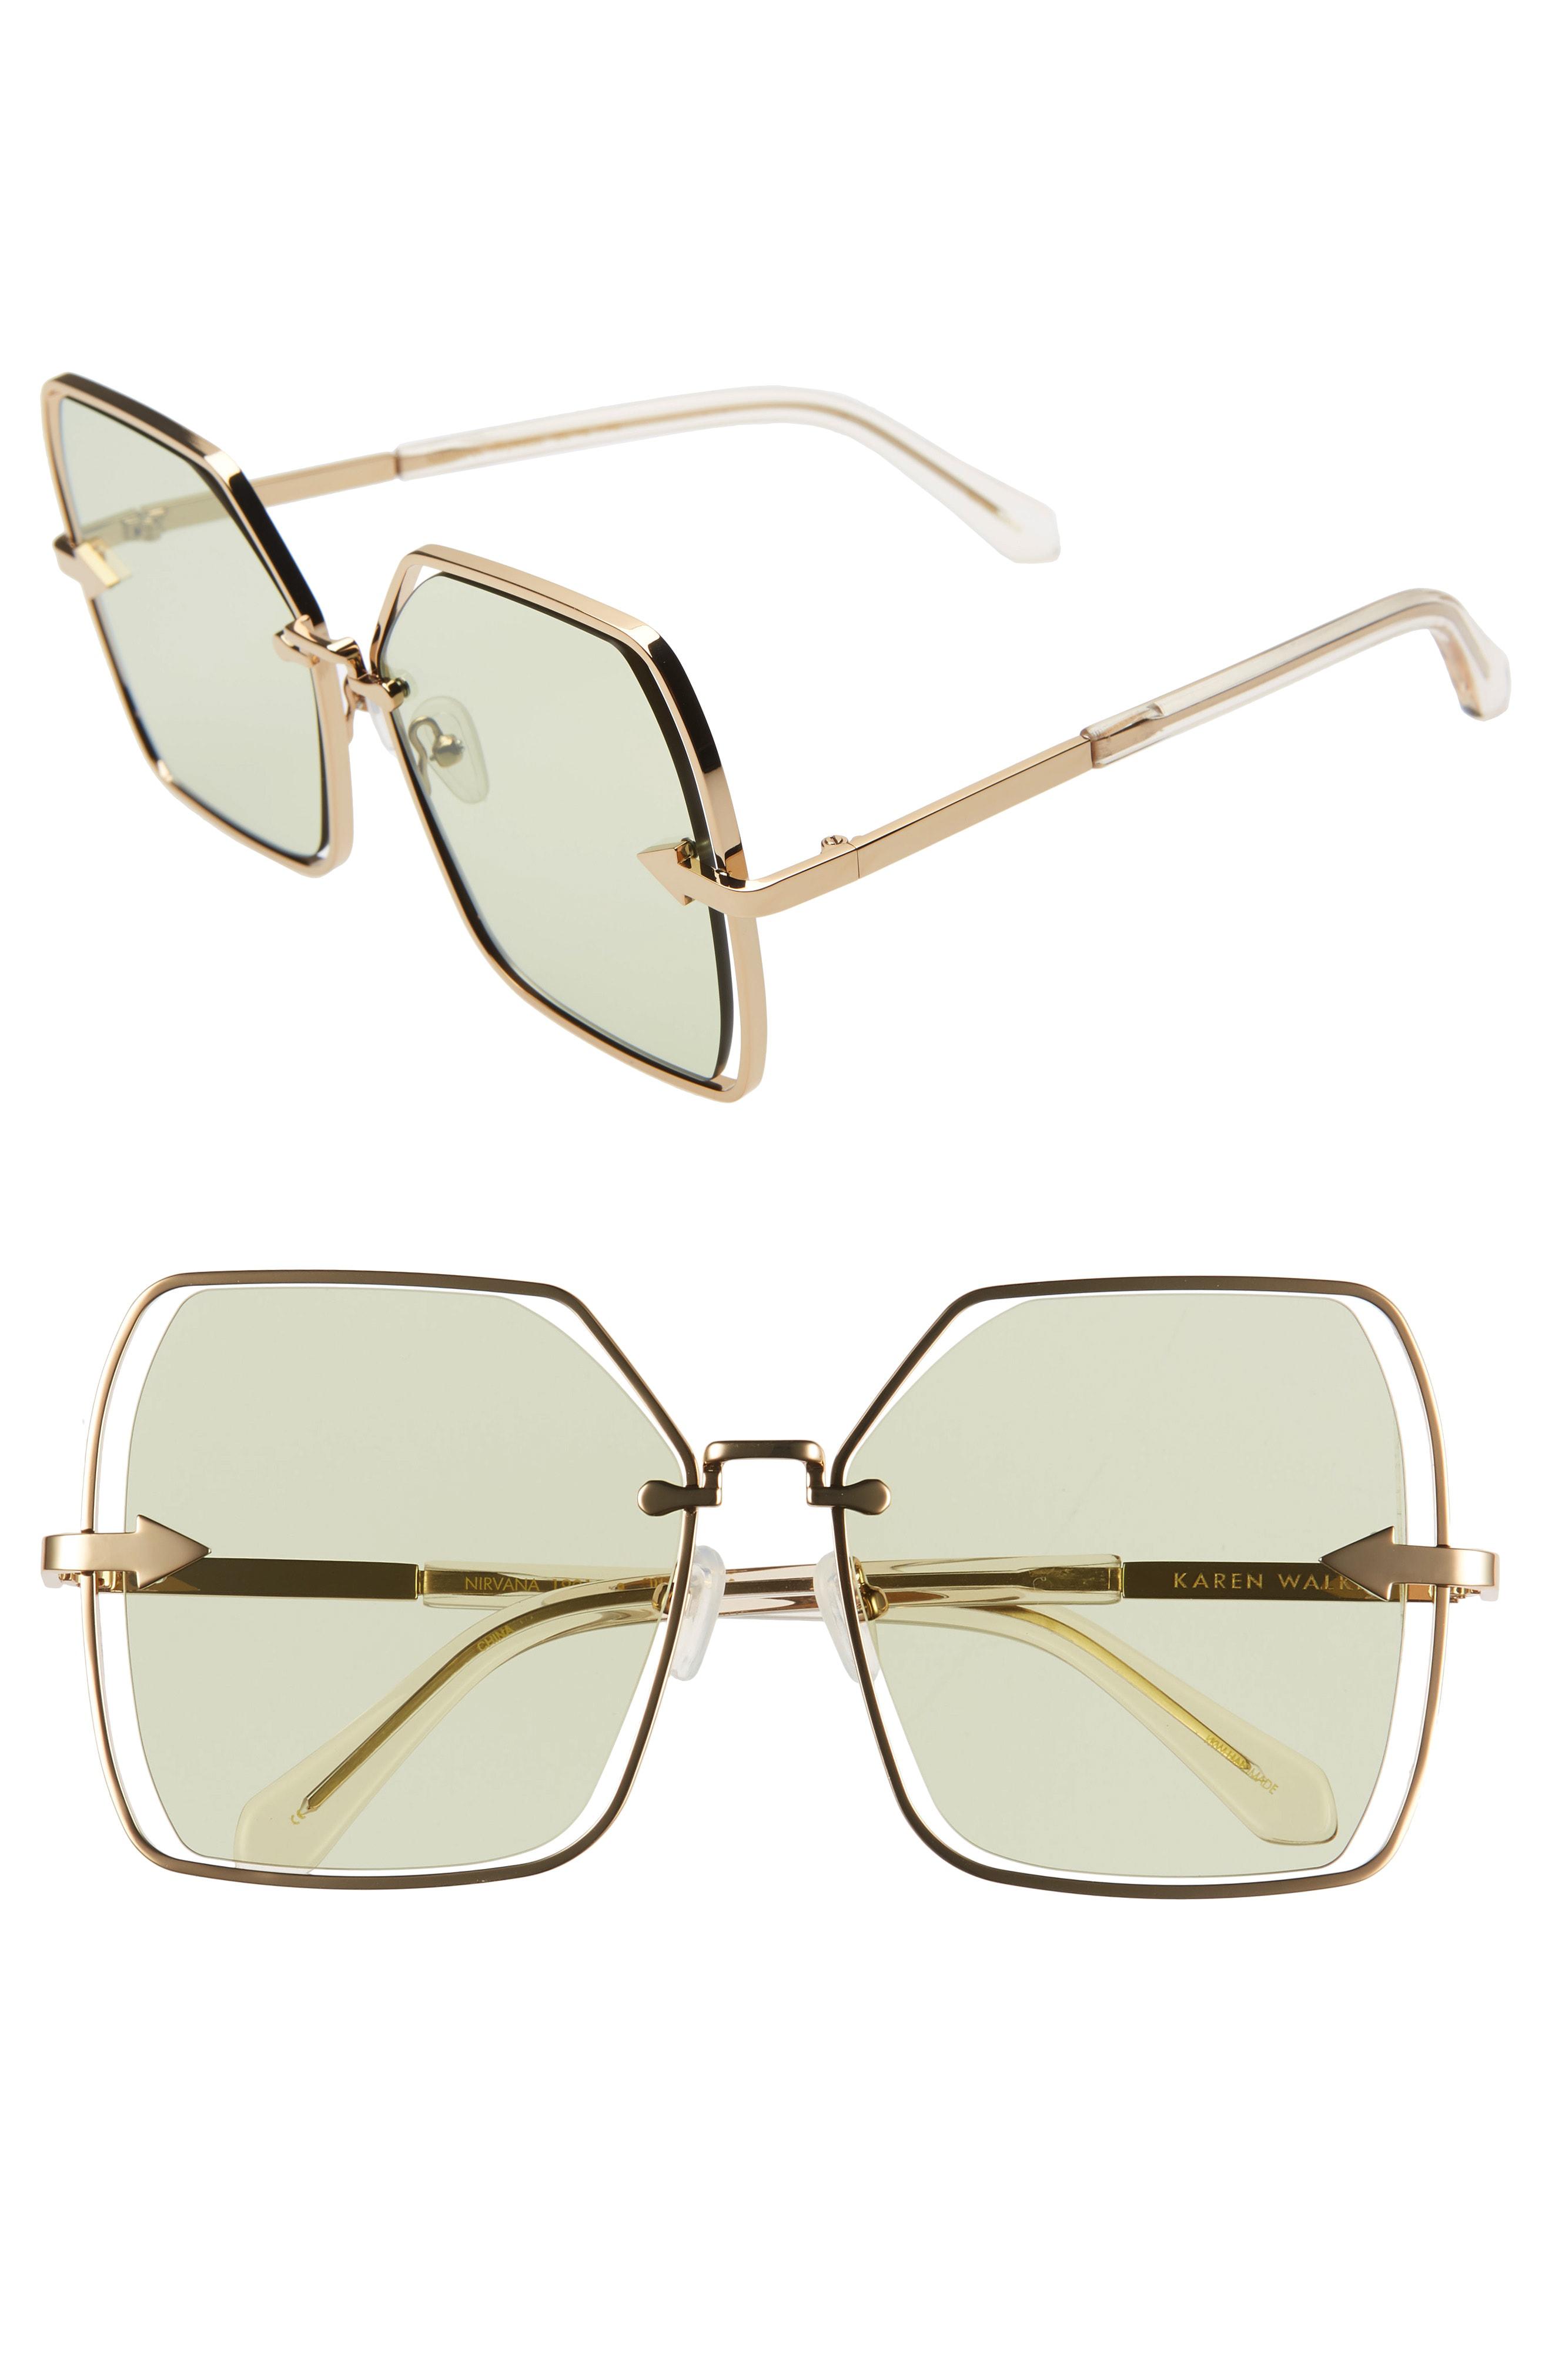 6ce760e4bd Karen Walker Nirvana 58Mm Square Butterfly Sunglasses - Gold/ Sage Tint